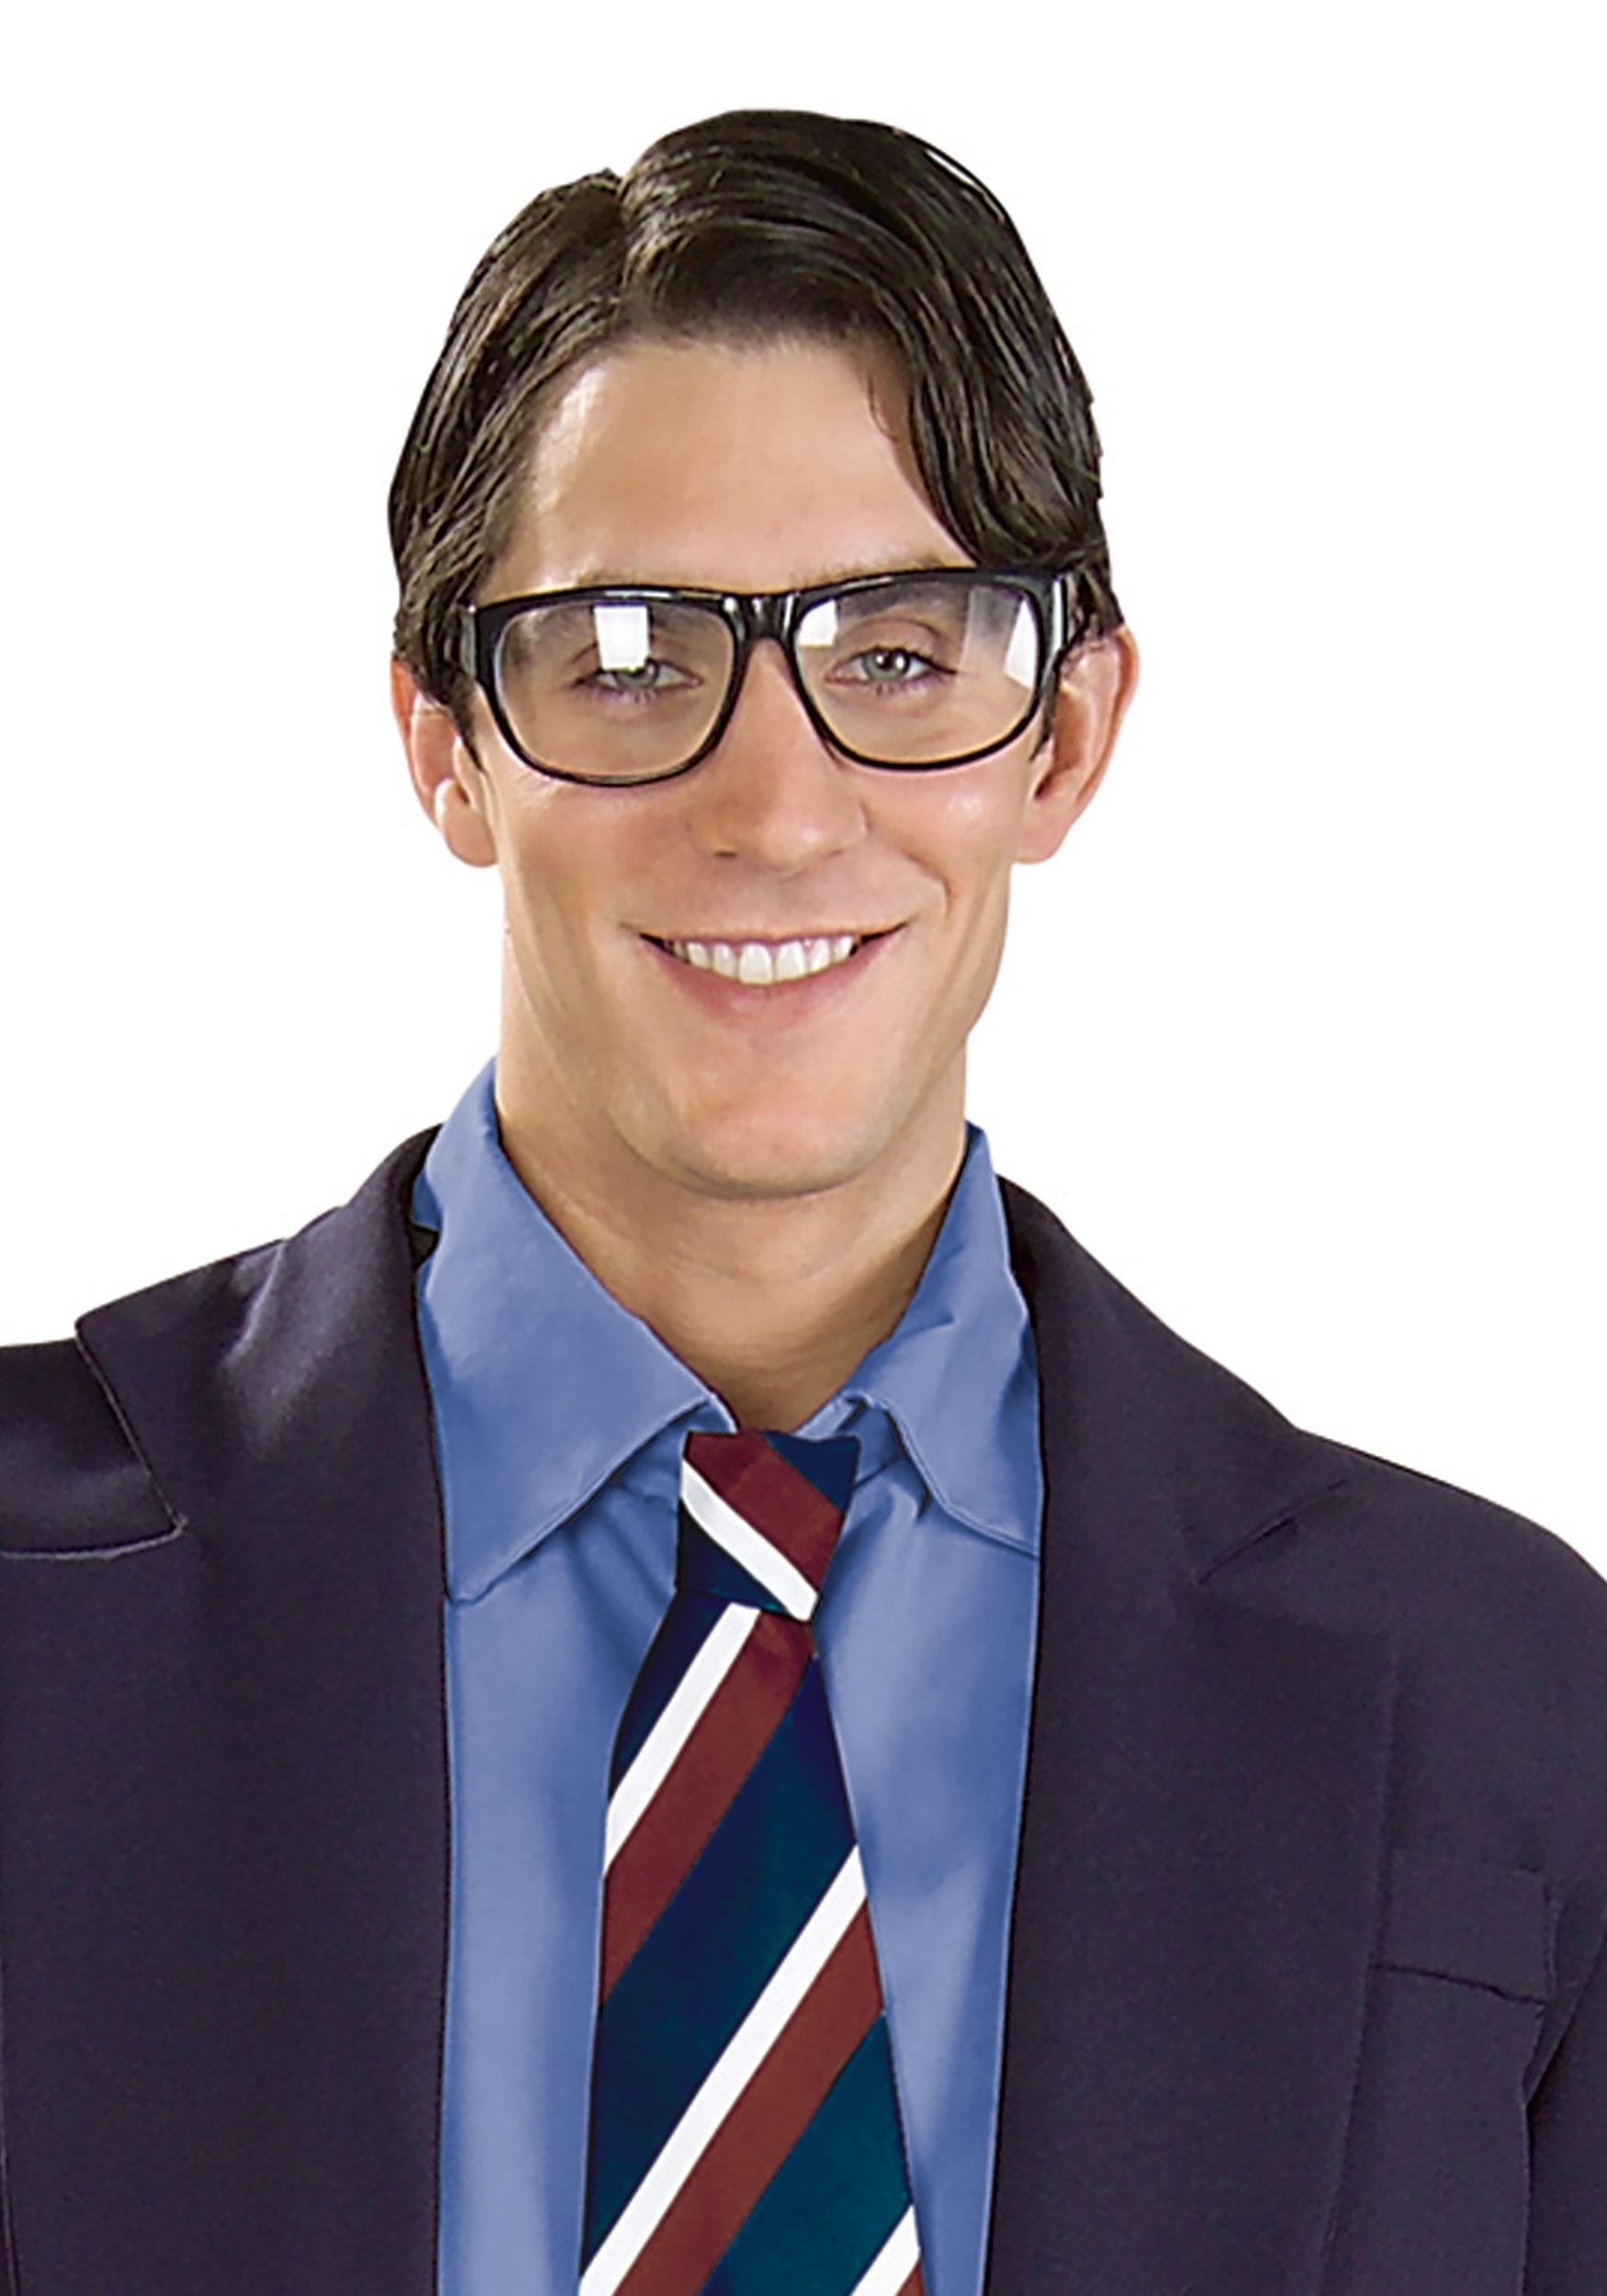 superman clark kent glasses